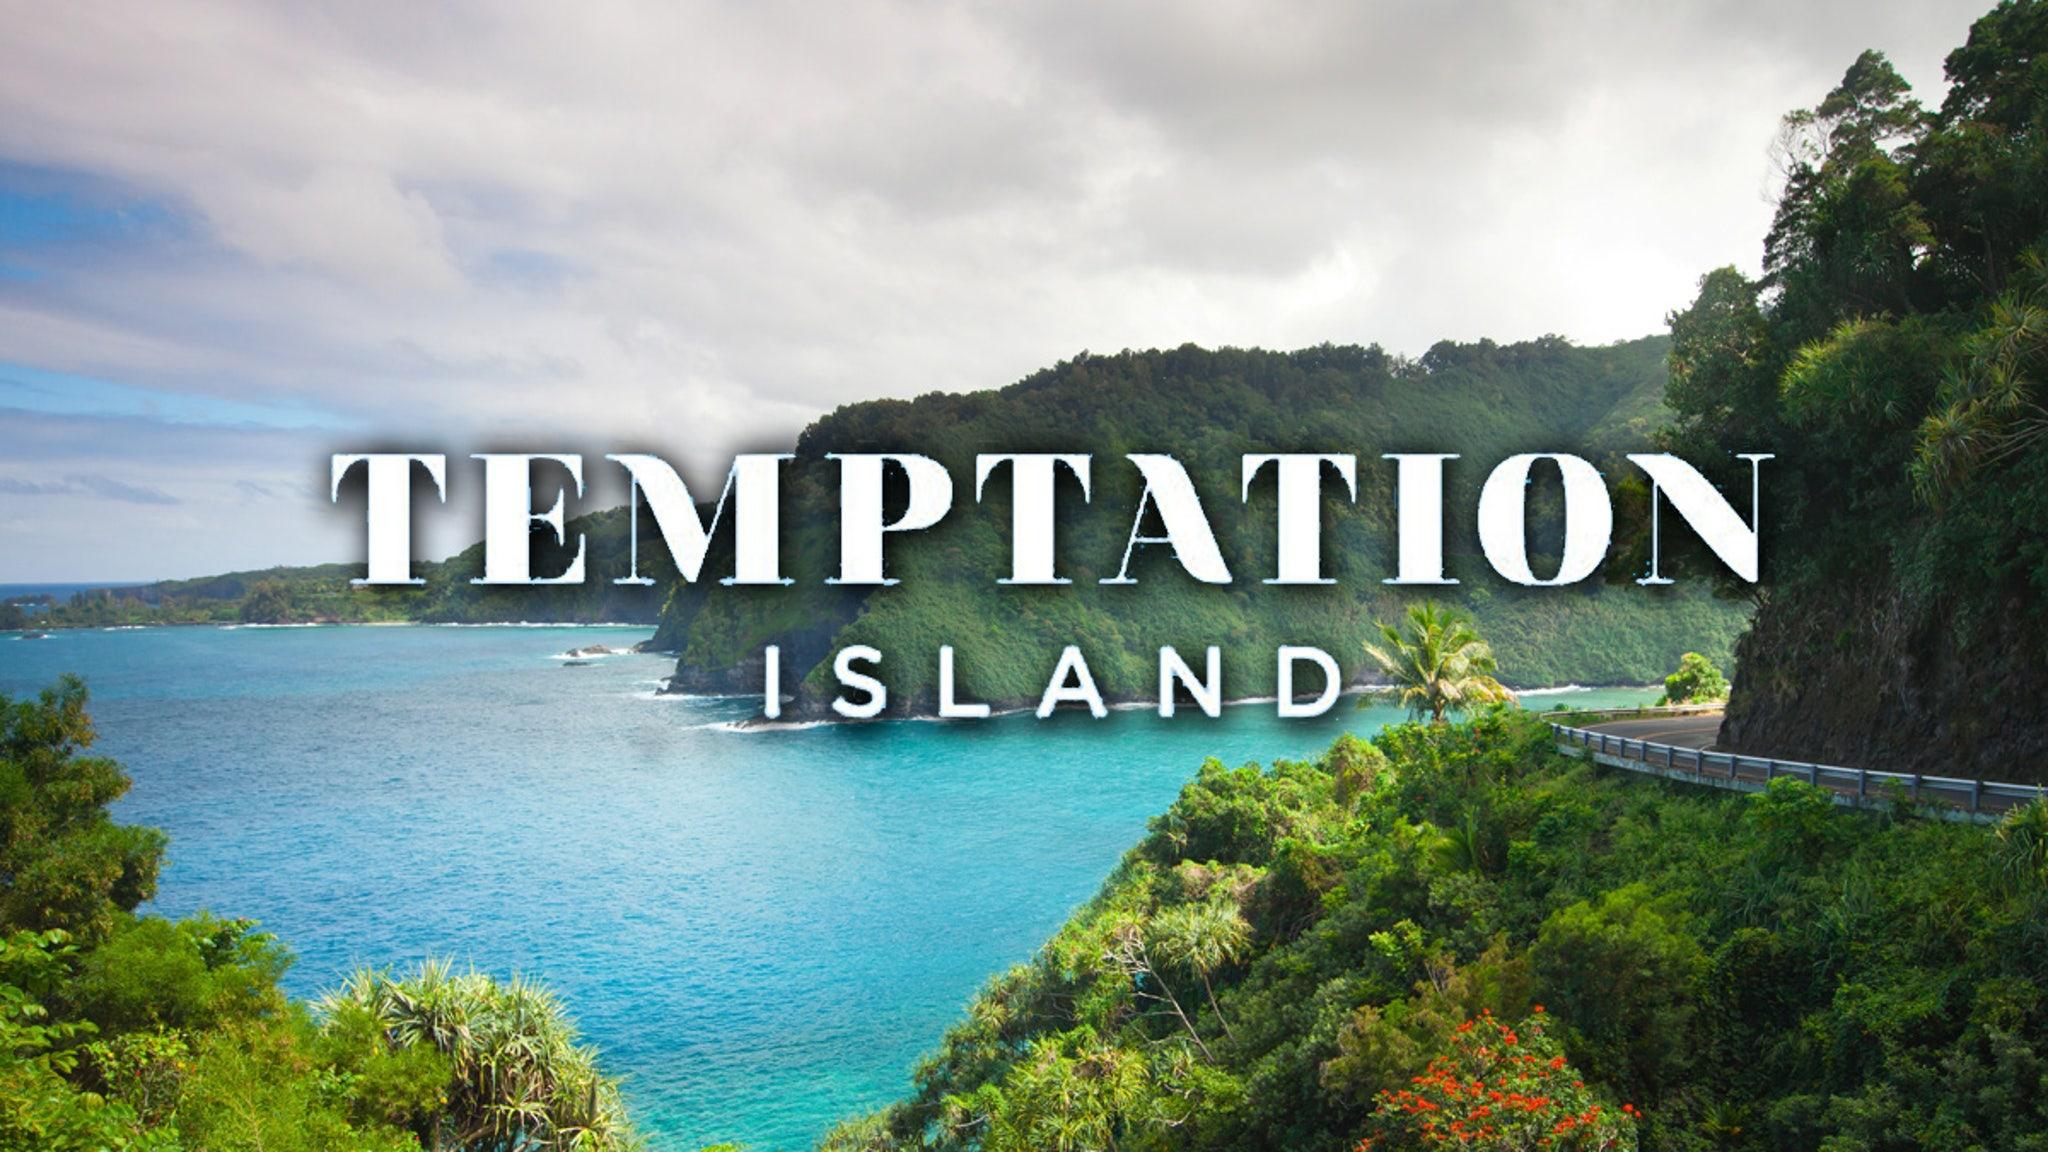 Temptation Island 31.03 20